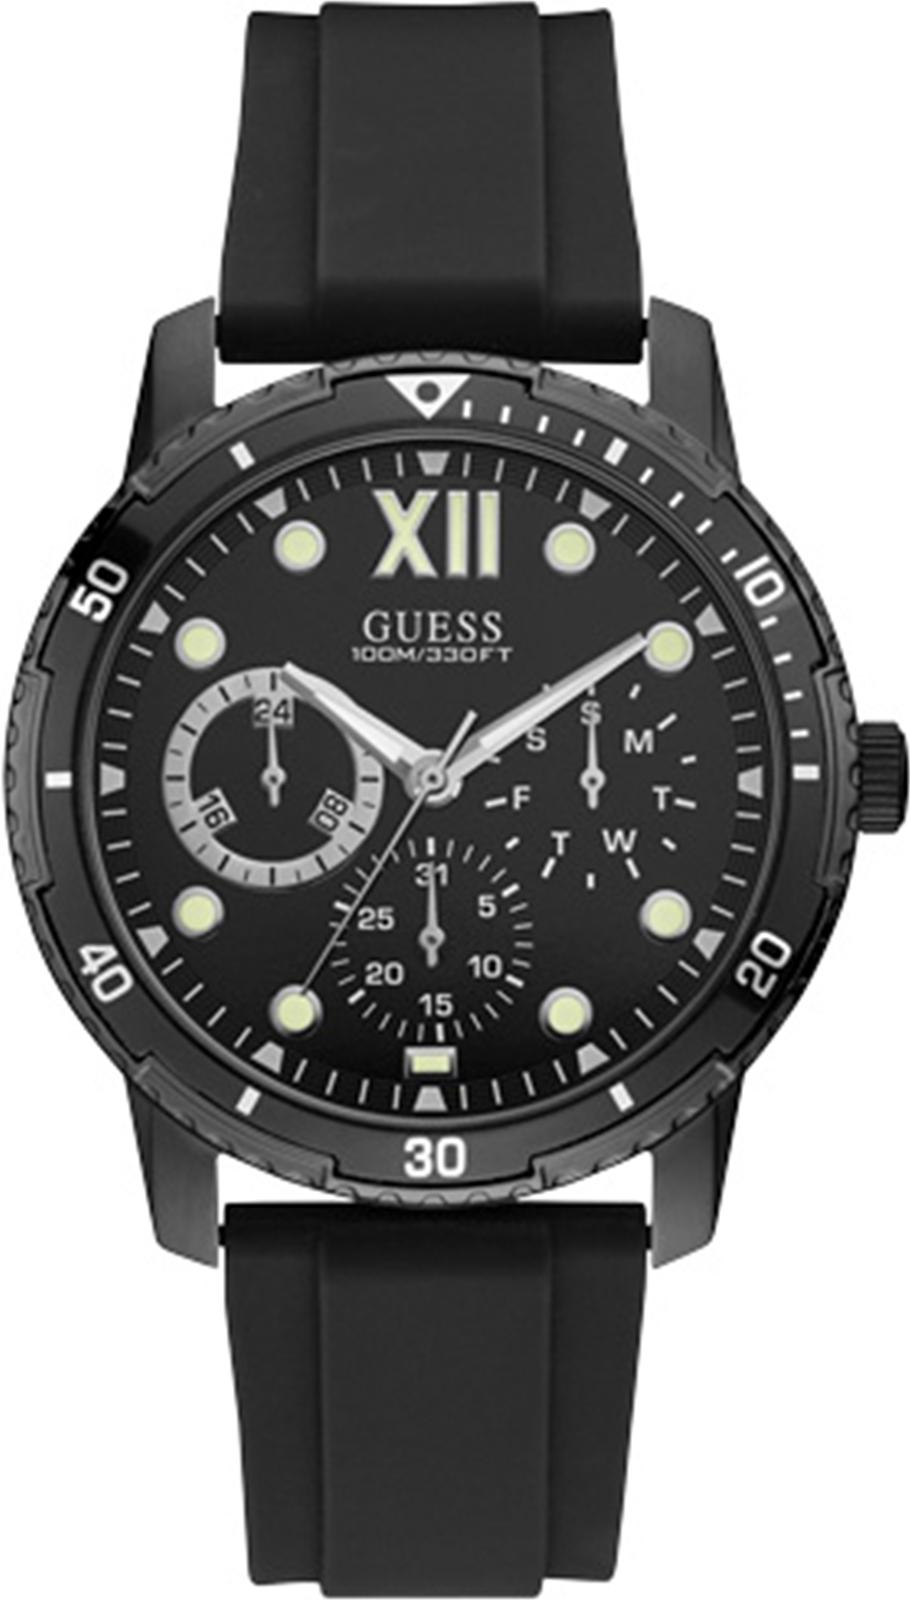 цена на Часы Guess OPTIMUM